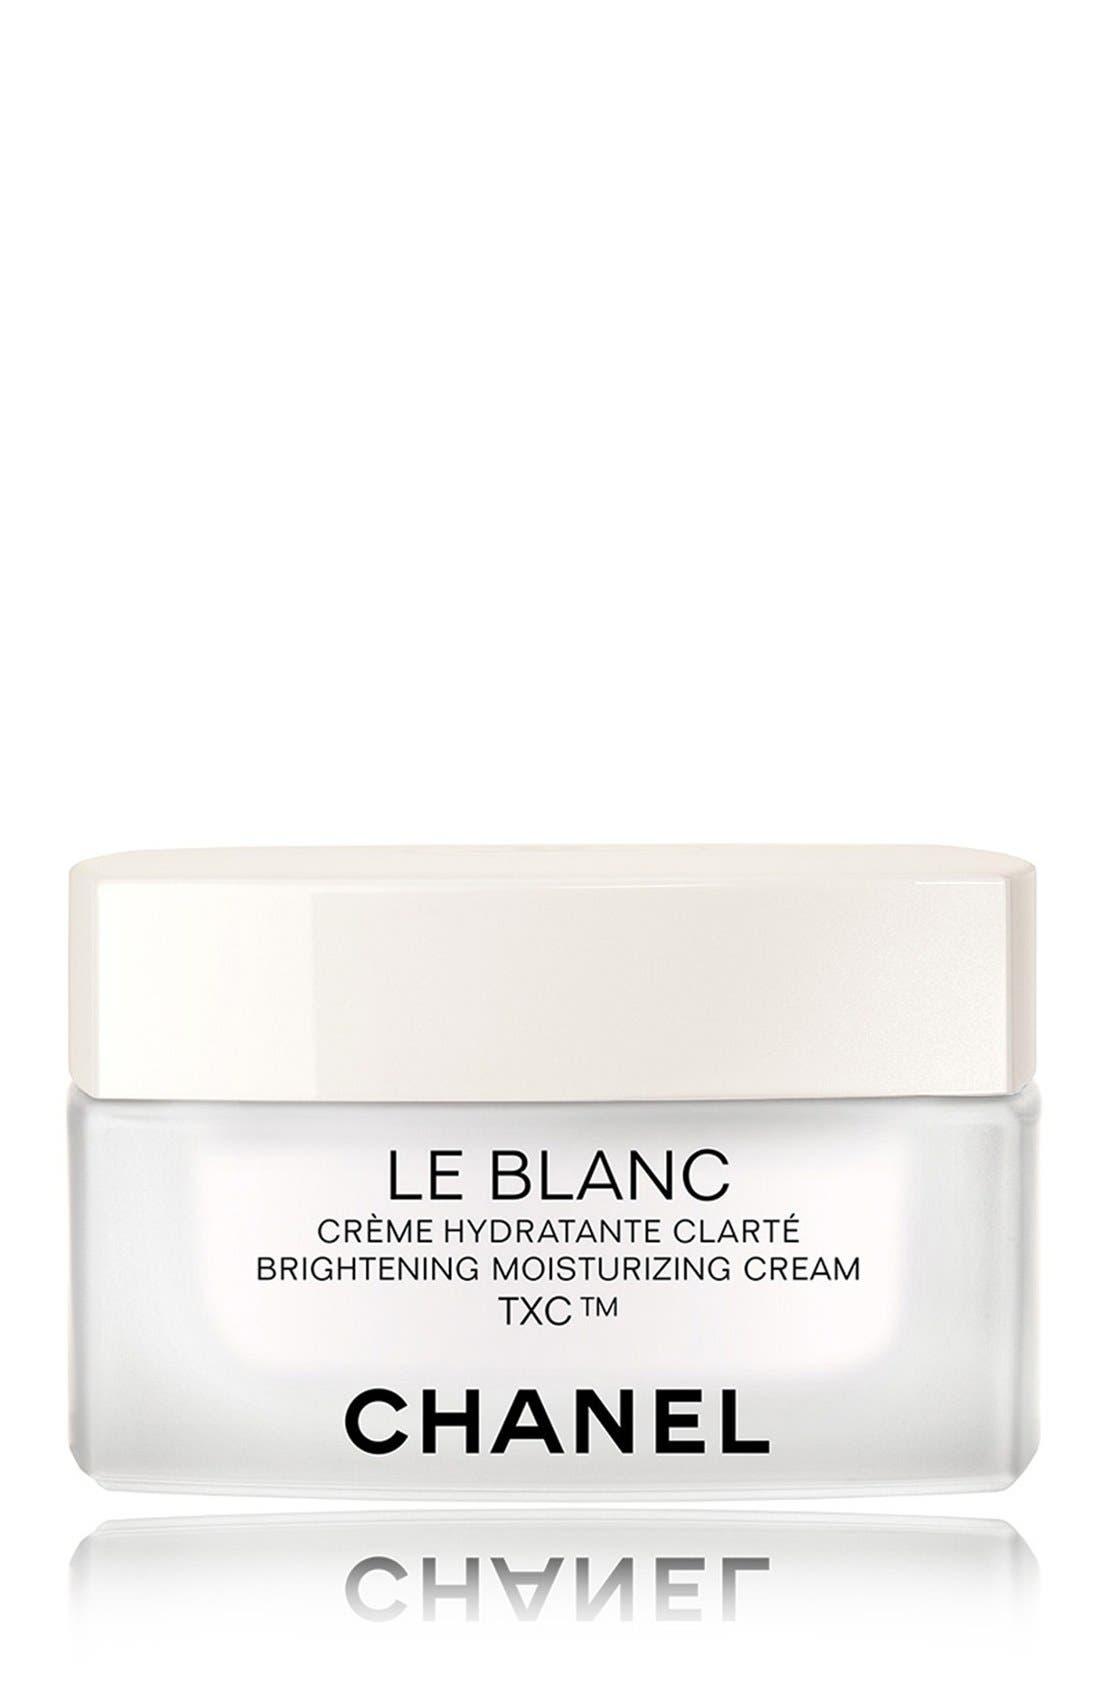 CHANEL LE BLANC  Brightening Moisturizing Cream TXC™